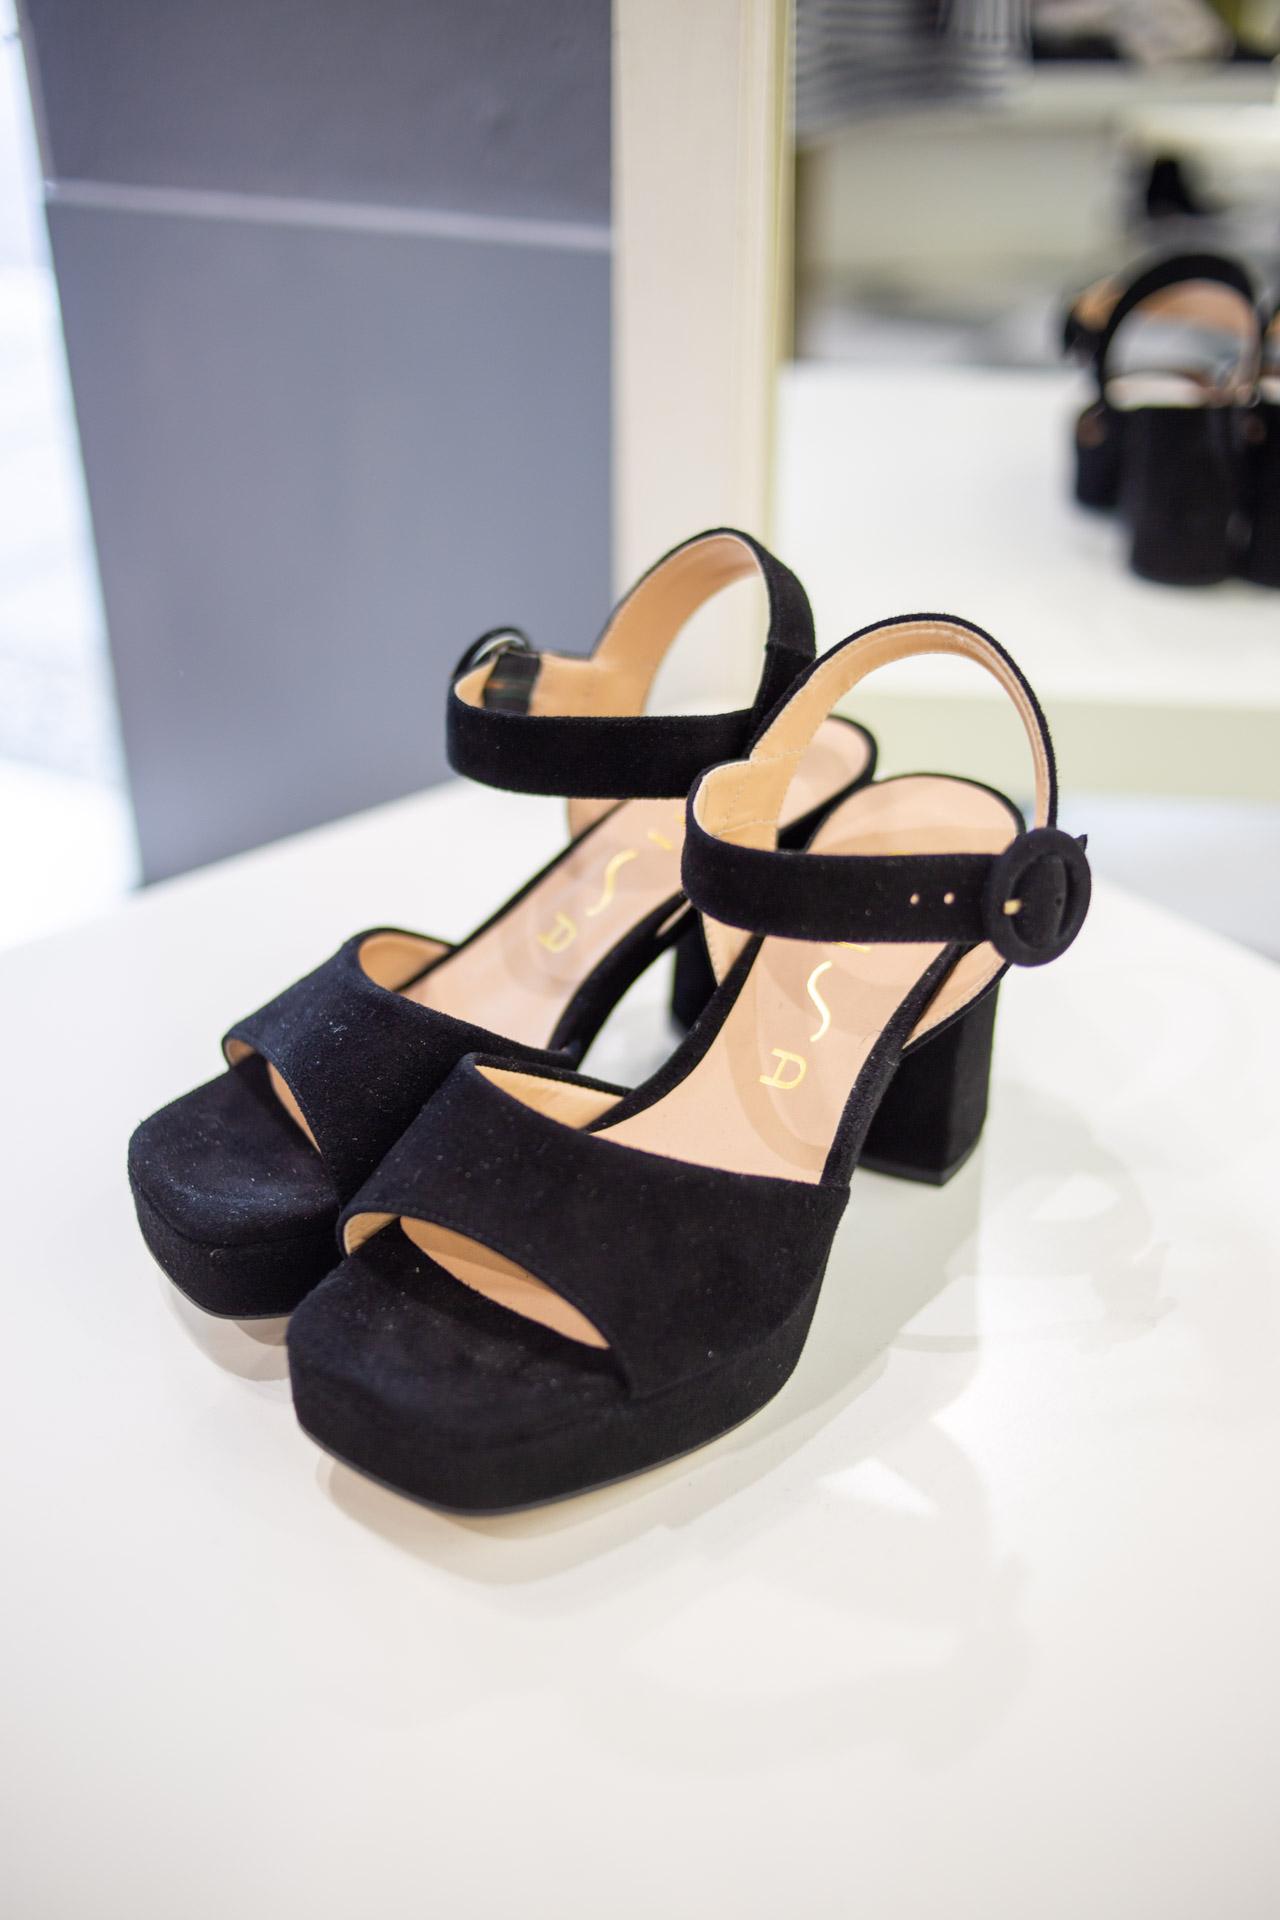 Sandali neri